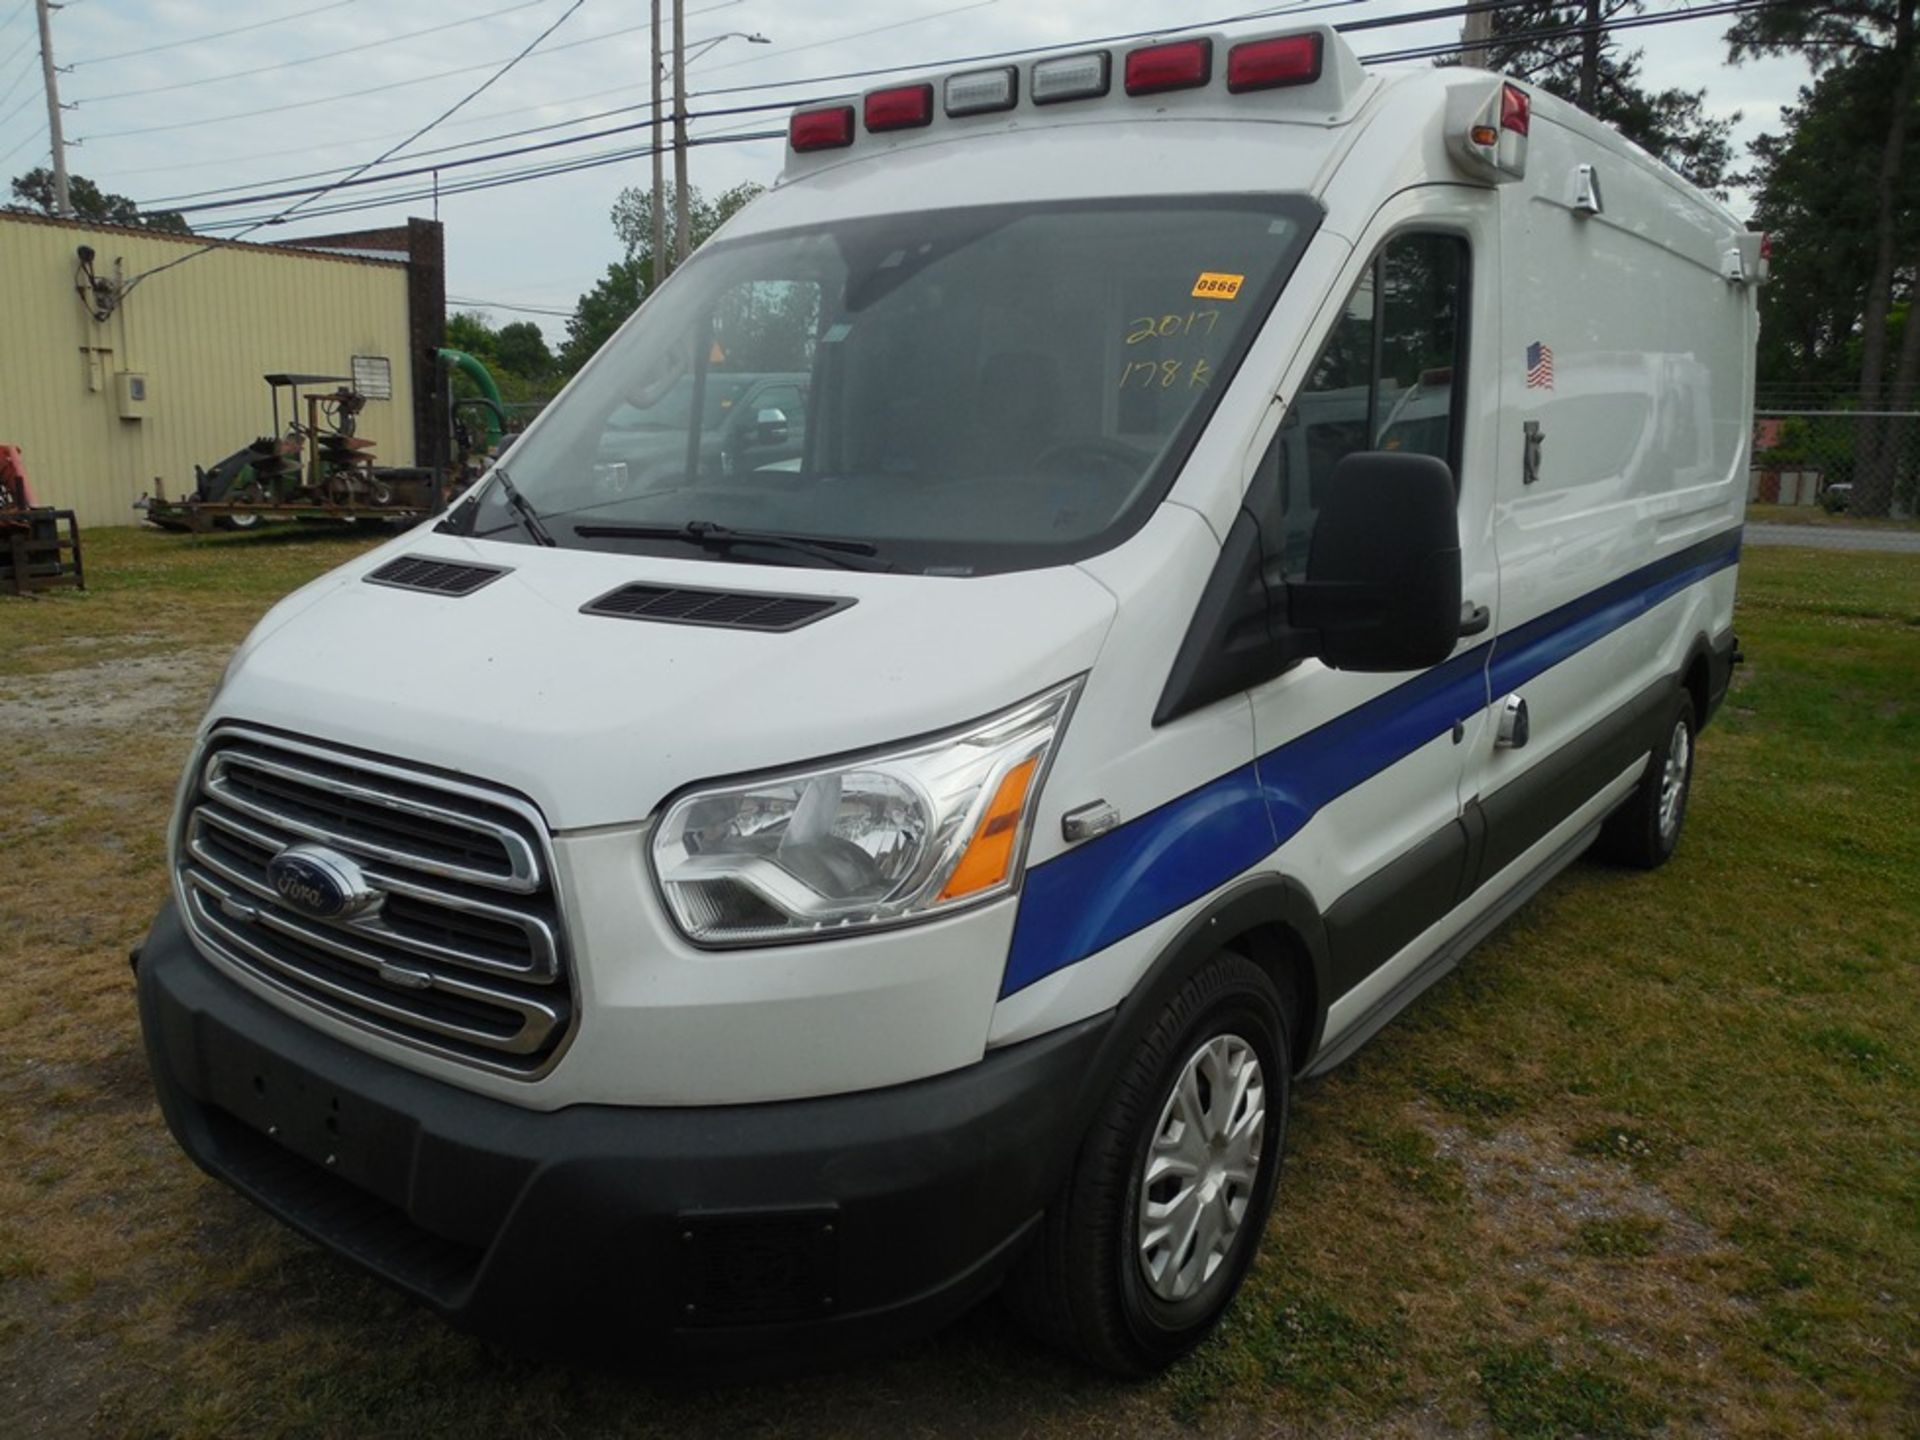 2017 Ford Tansit 250 dsl ambulance 178,503 miles vin# 1FDYR2CV2HKA57713 - Image 2 of 6